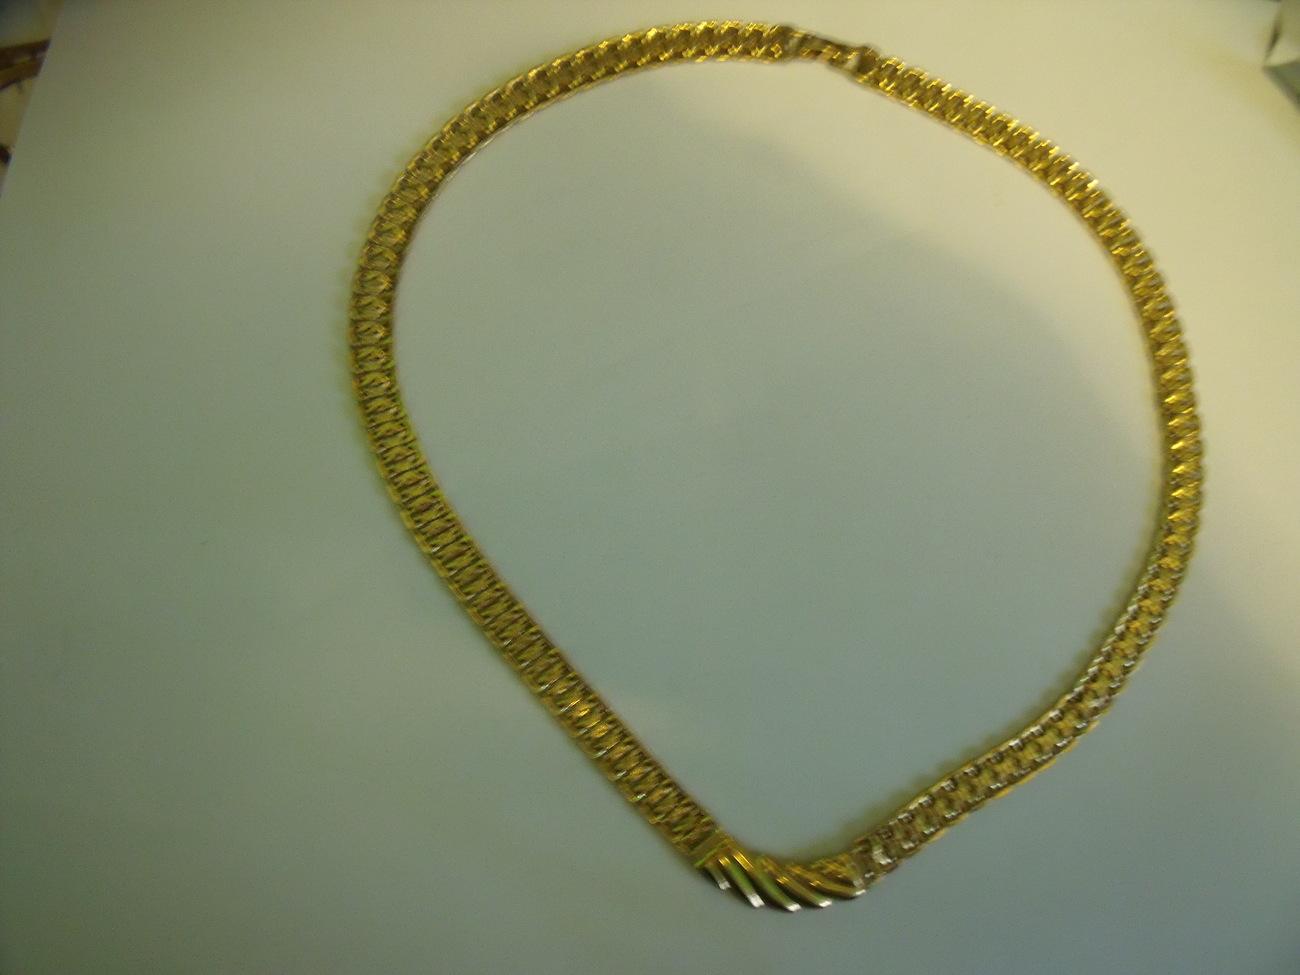 Monet goldtone flexible with center chevron necklace